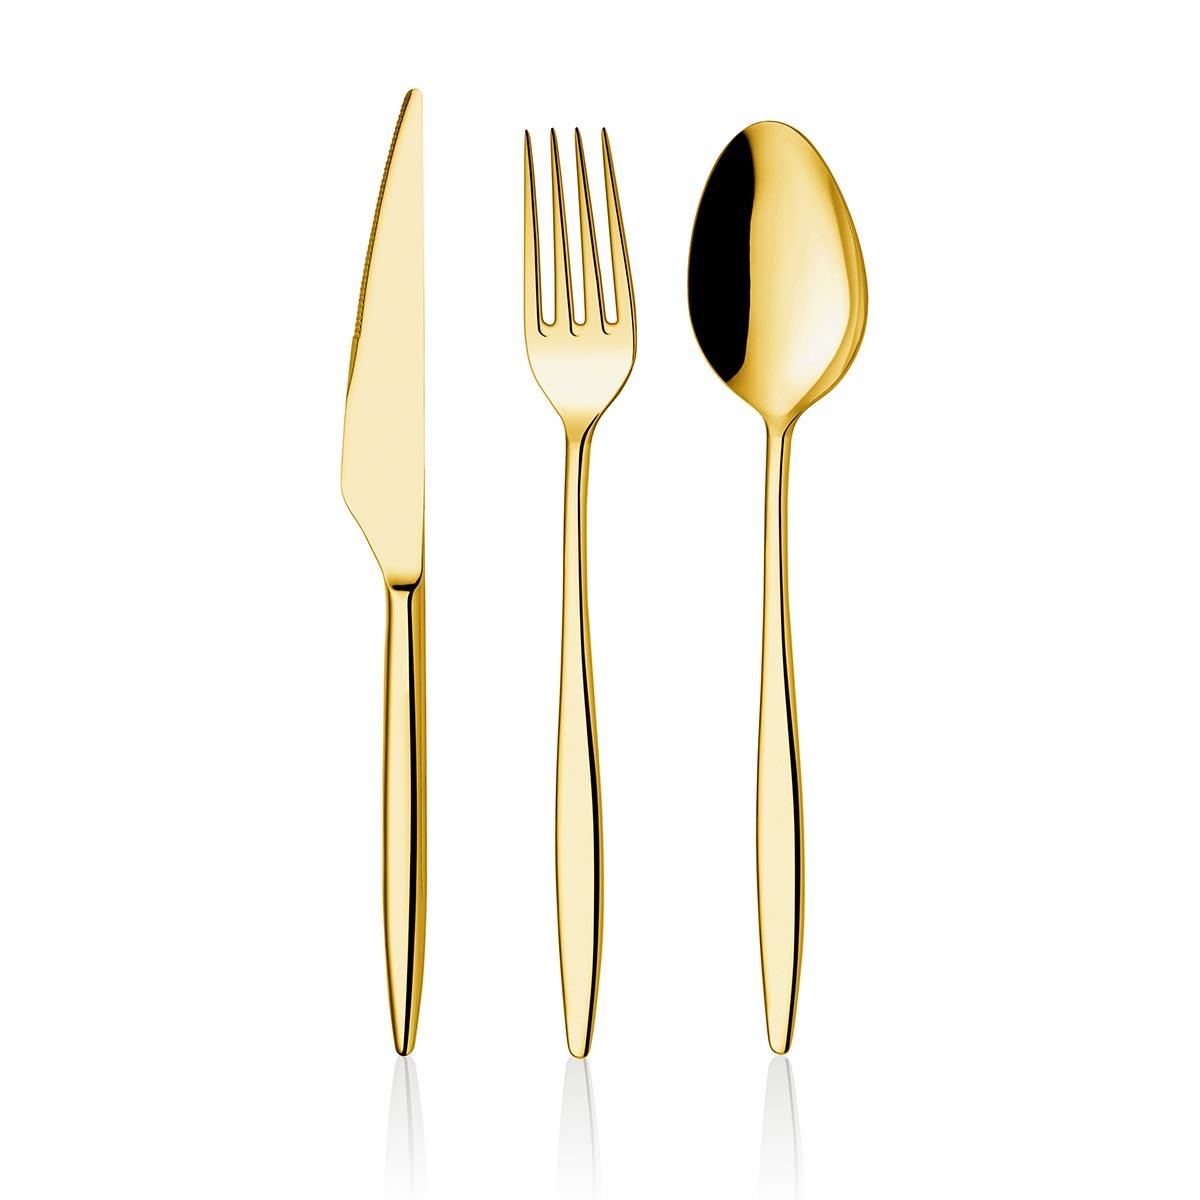 ONON Assos Altın Titanyum 84 Parça Çatal Kaşık Bıçak Takımı Kutu 1